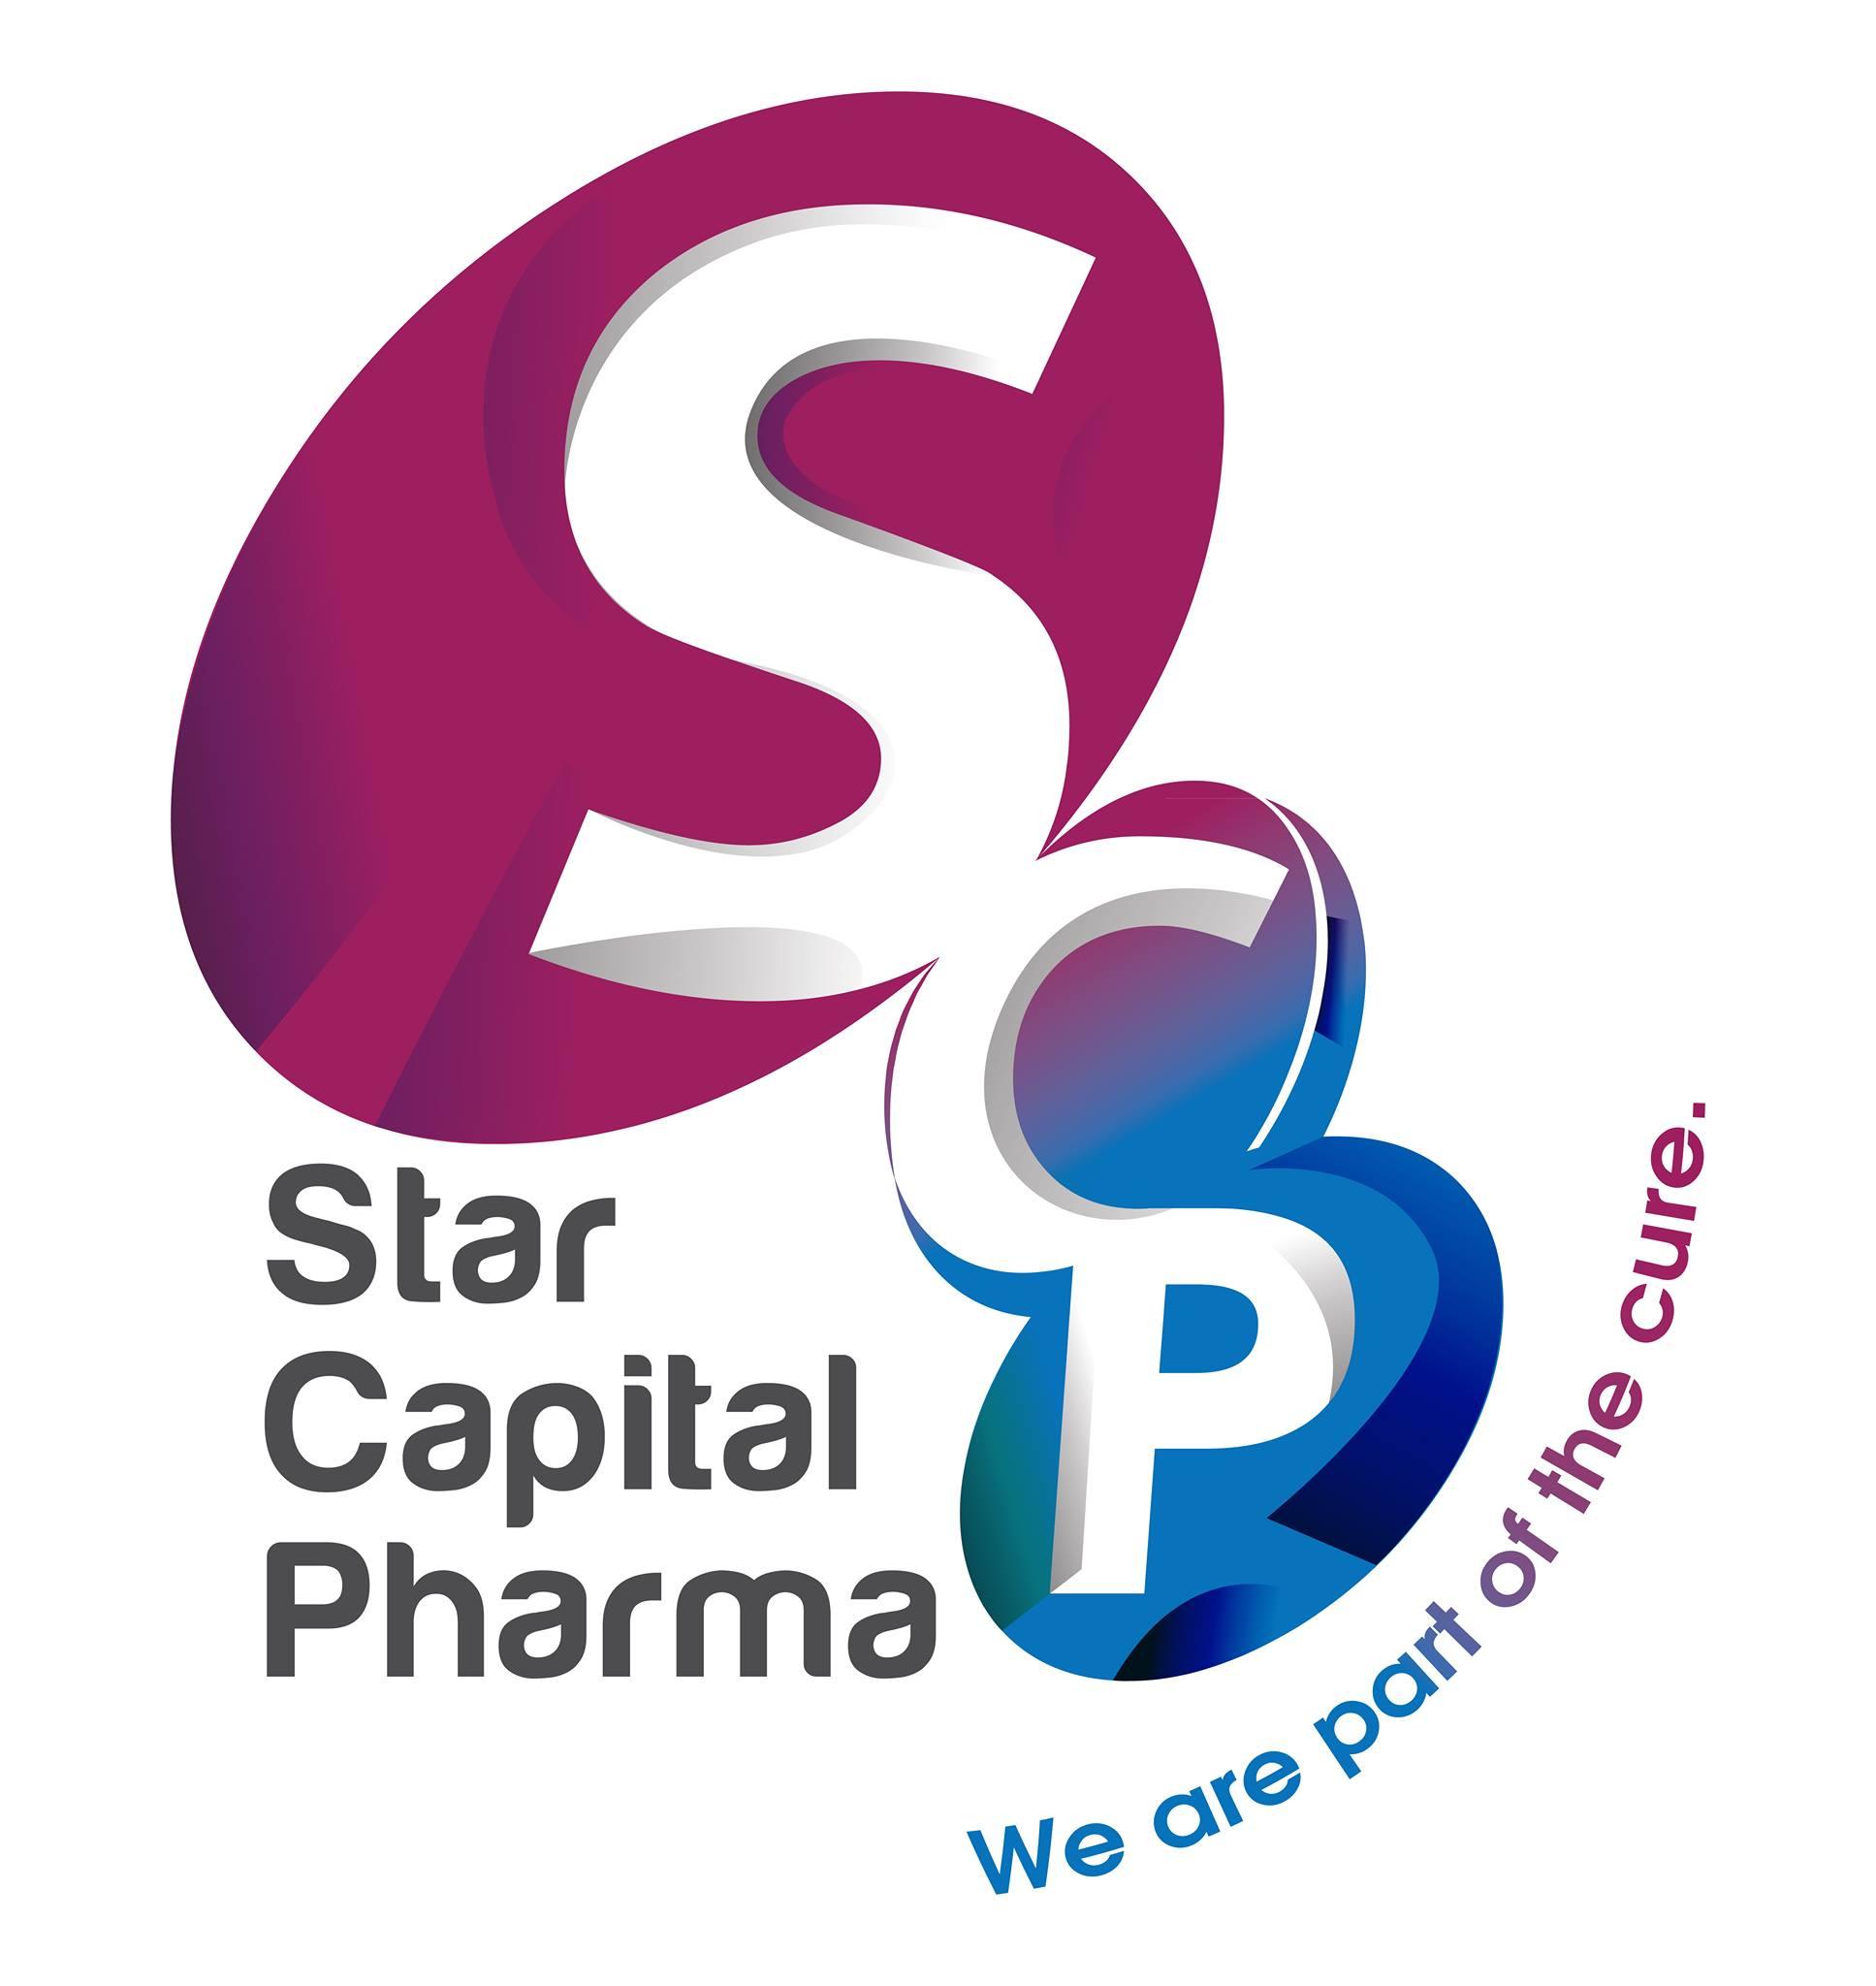 Star Capital Pharma